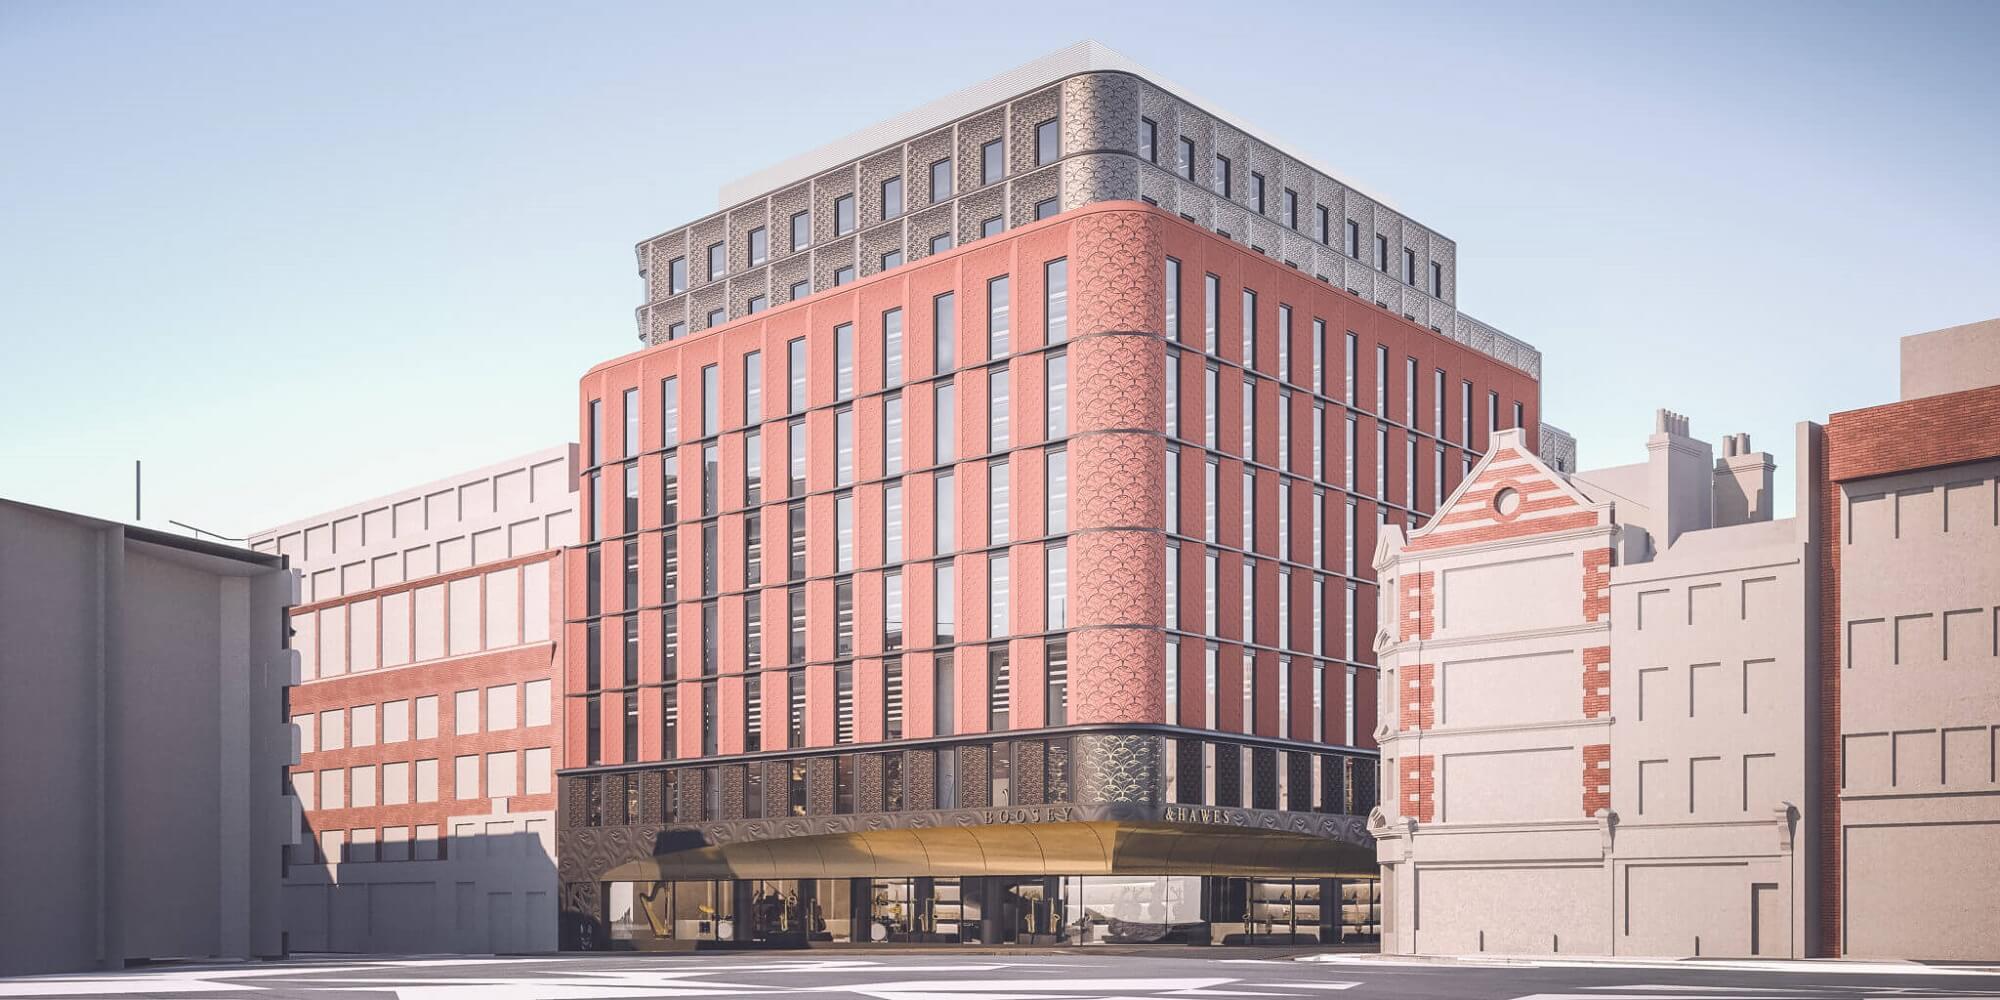 Retaining Wall Solution - Ilona Rose House, Tottenham Court Road - LDA piling Secant Wall Basement (CGI)